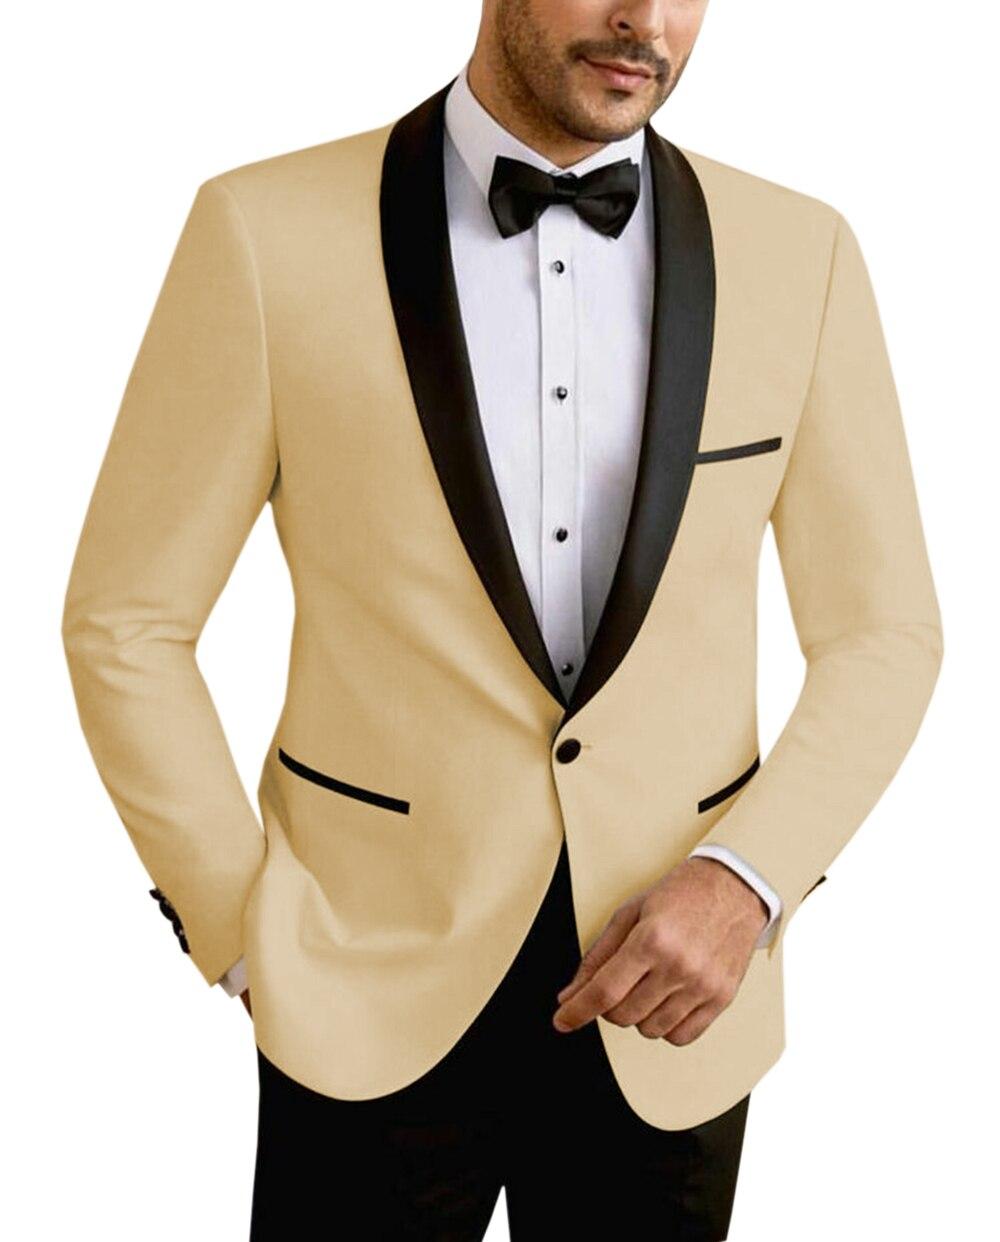 Beige/White/Champagne Mens Suits 2 Piece Leisure V Neck Shawl Lapel Groomsmen Tuxedos Men Suits for Wedding (Jacket+Pants)